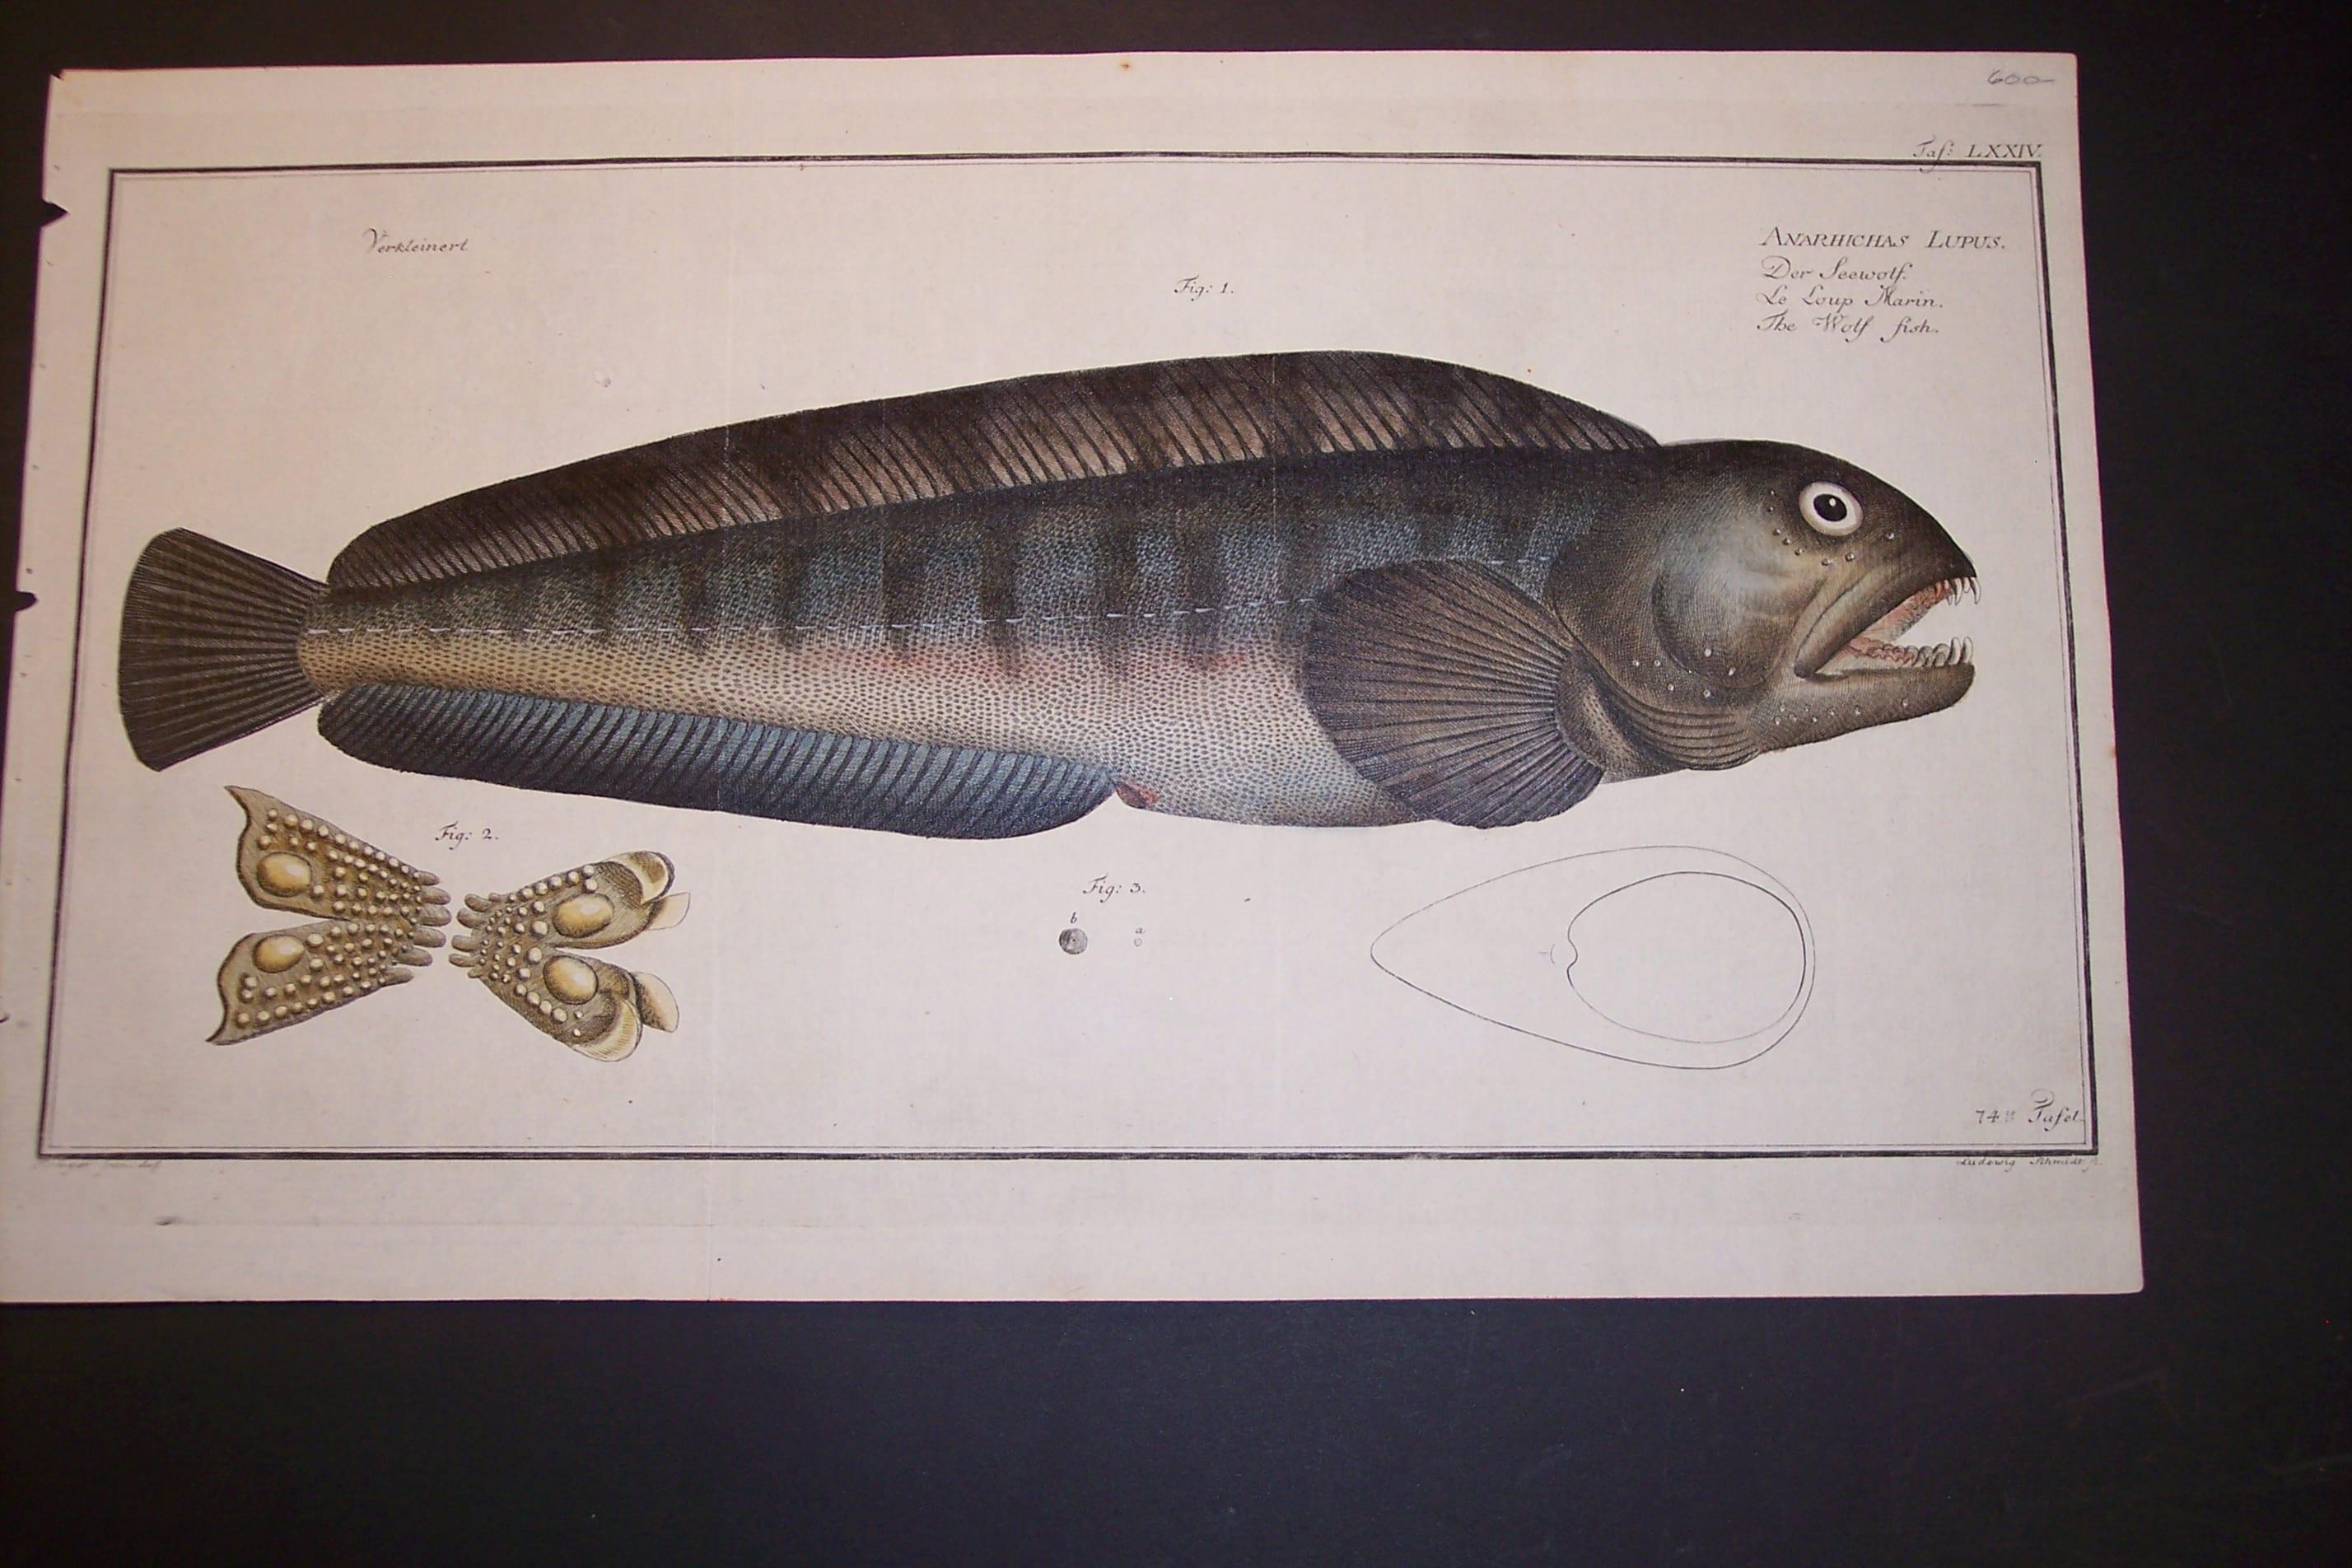 Bloch Wolf Fish Engraving Pl. LXXIV